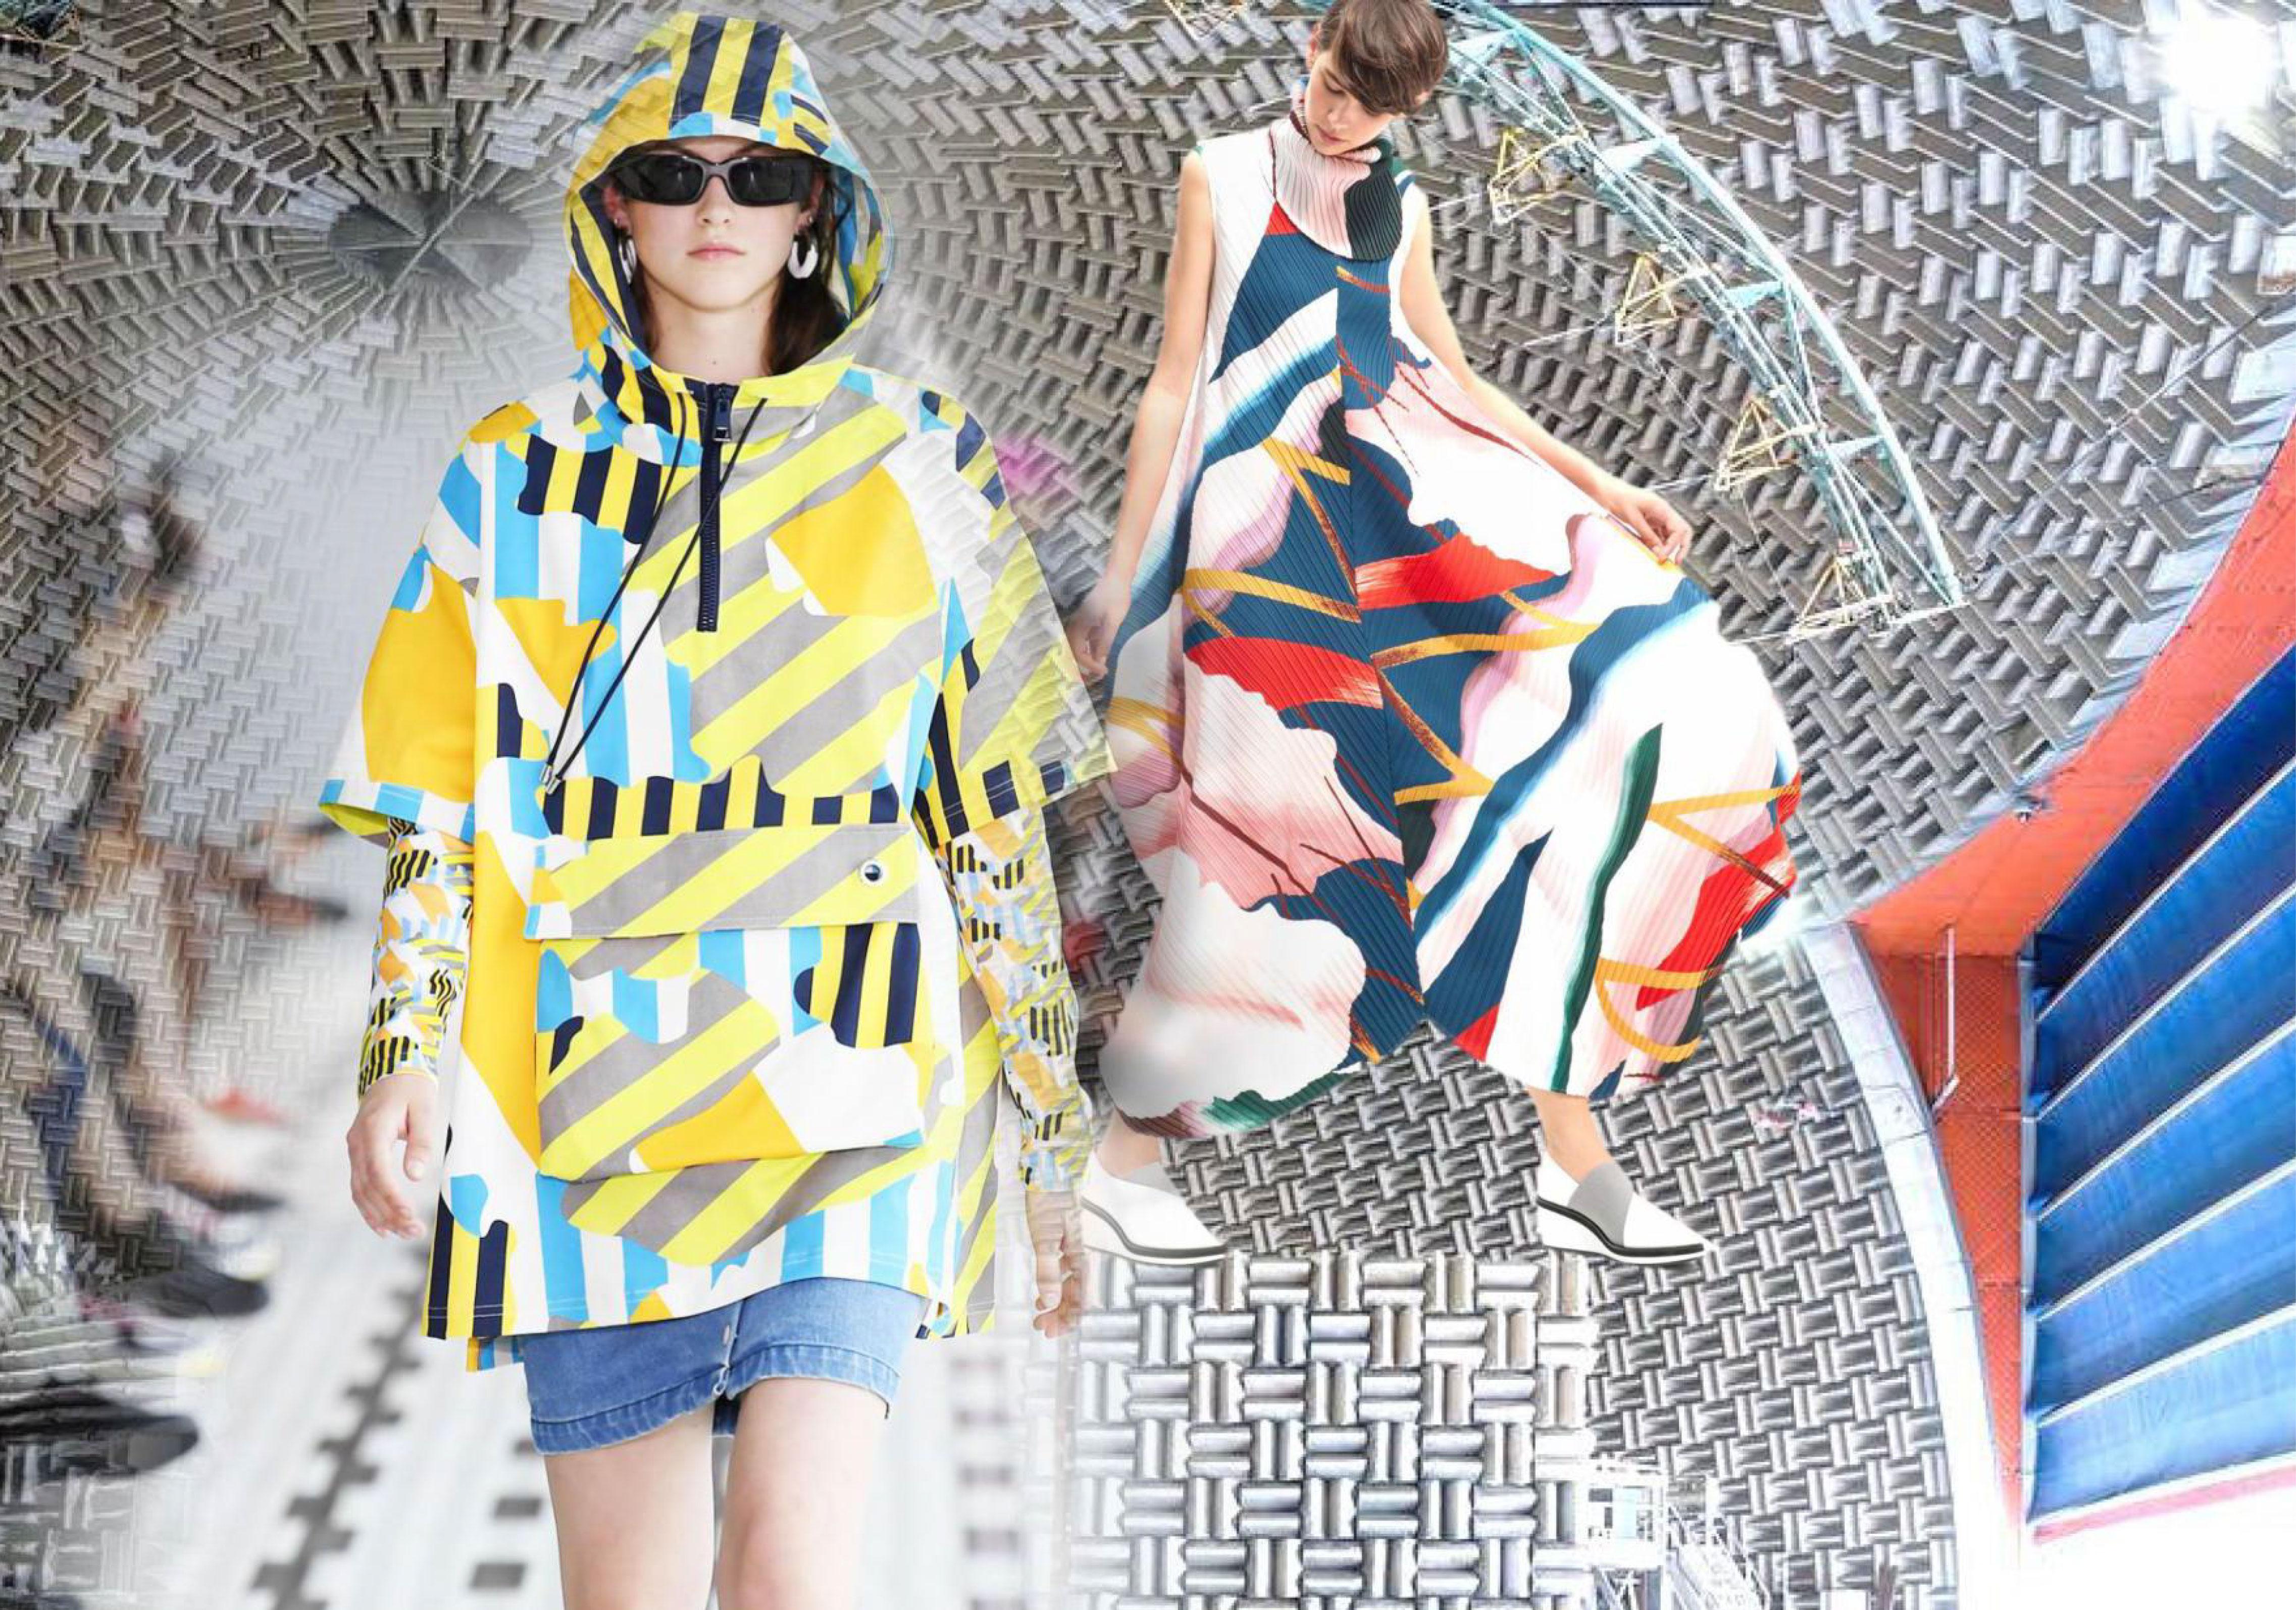 2019 S/S Fabrics for Womenswear on Catwalks -- Novel Geometries